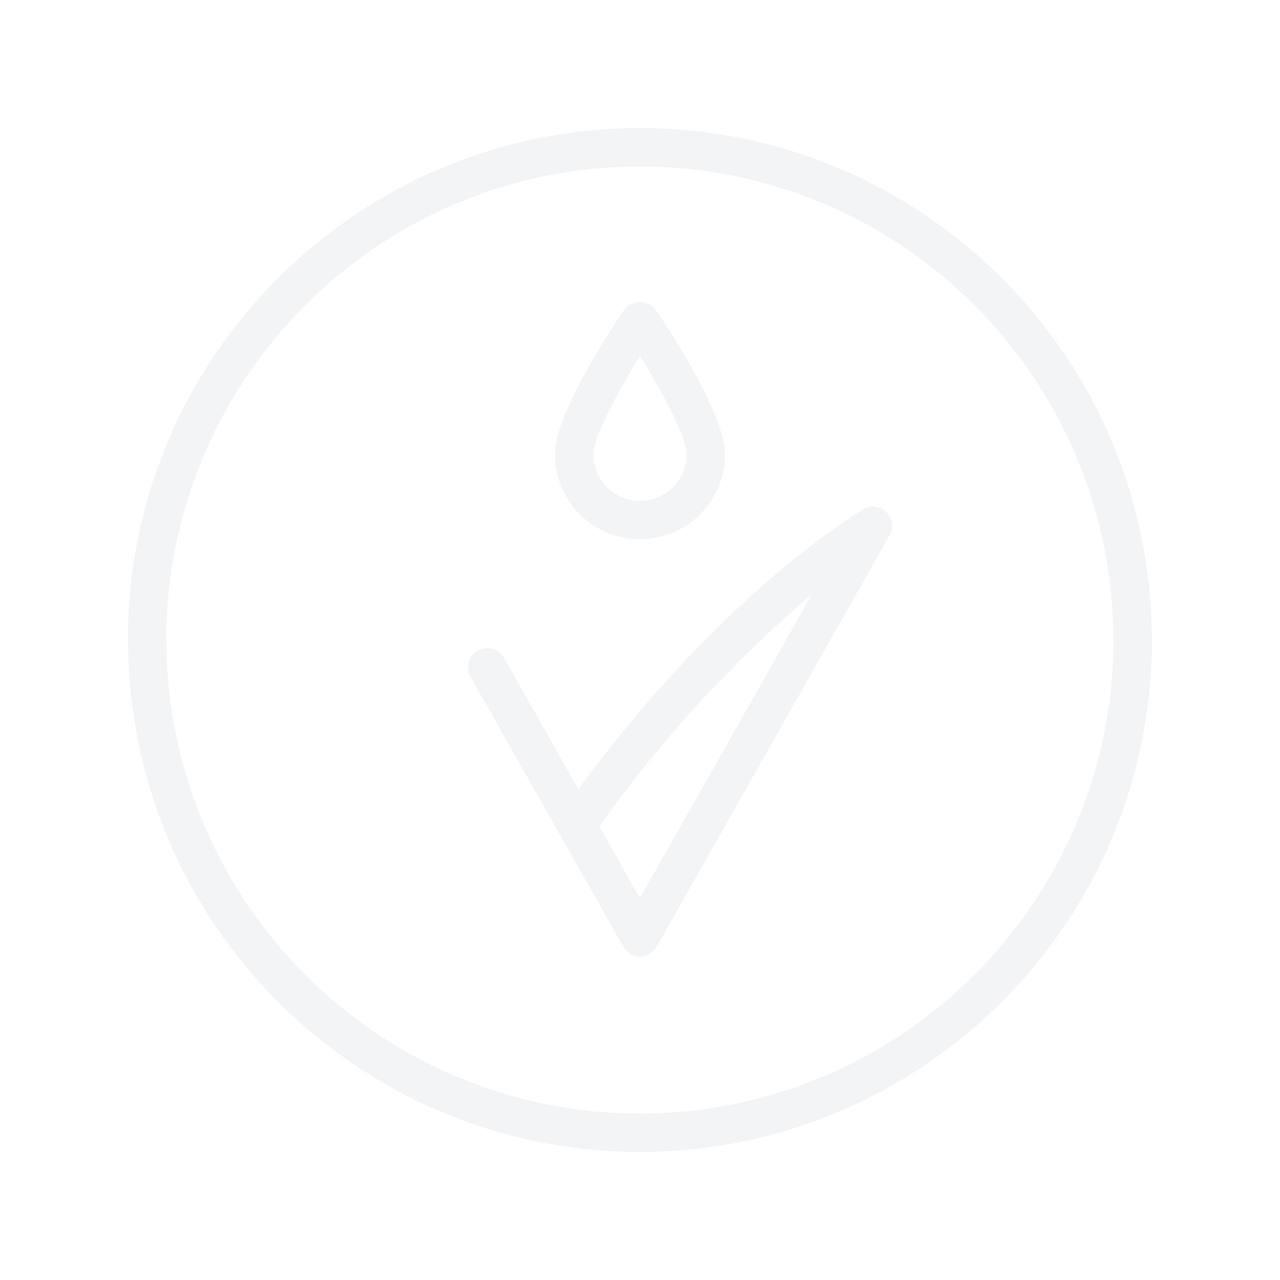 COLLISTAR Cleansing Foam-Cream очищающамй крем-пенка 150ml